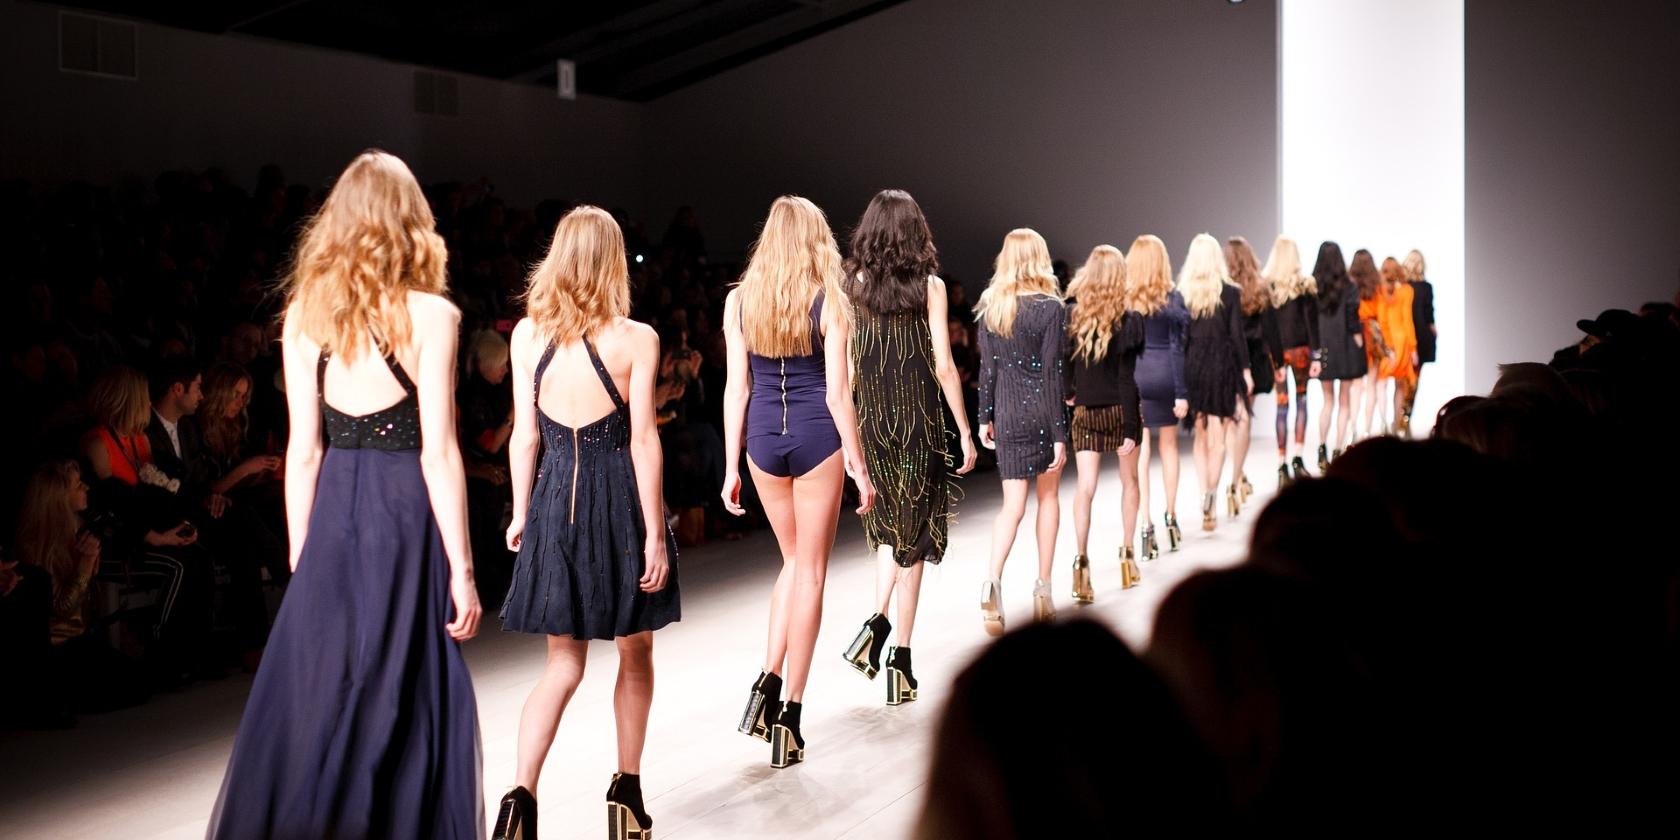 Fashion Show Fundraiser Ideas - Fundraiser Help 64